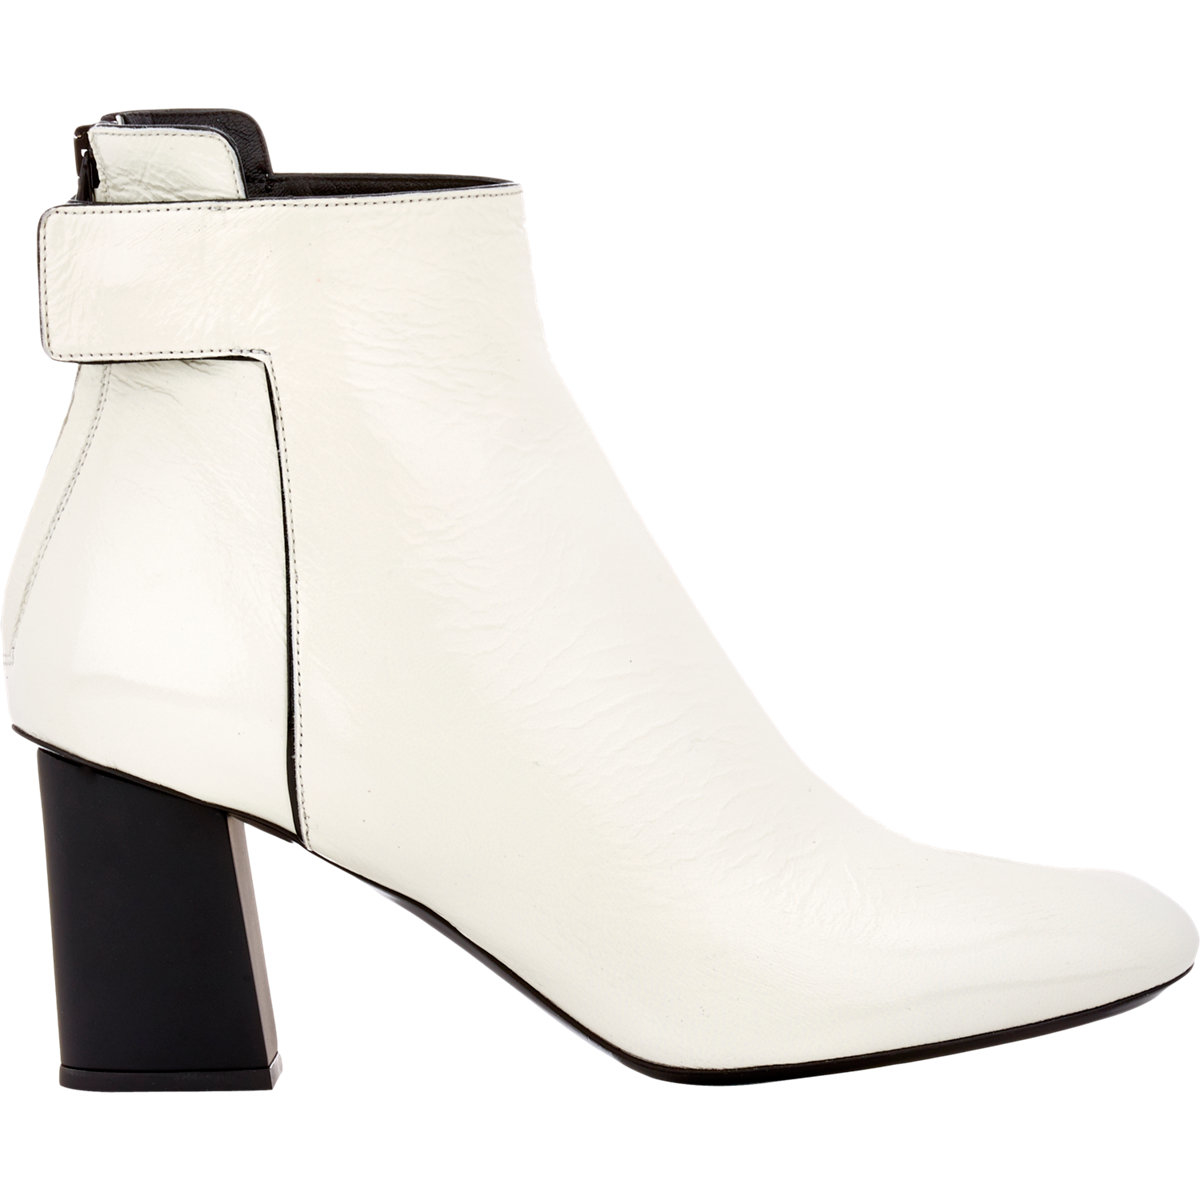 Proenza schouler Women's Ankle Boots in White | Lyst